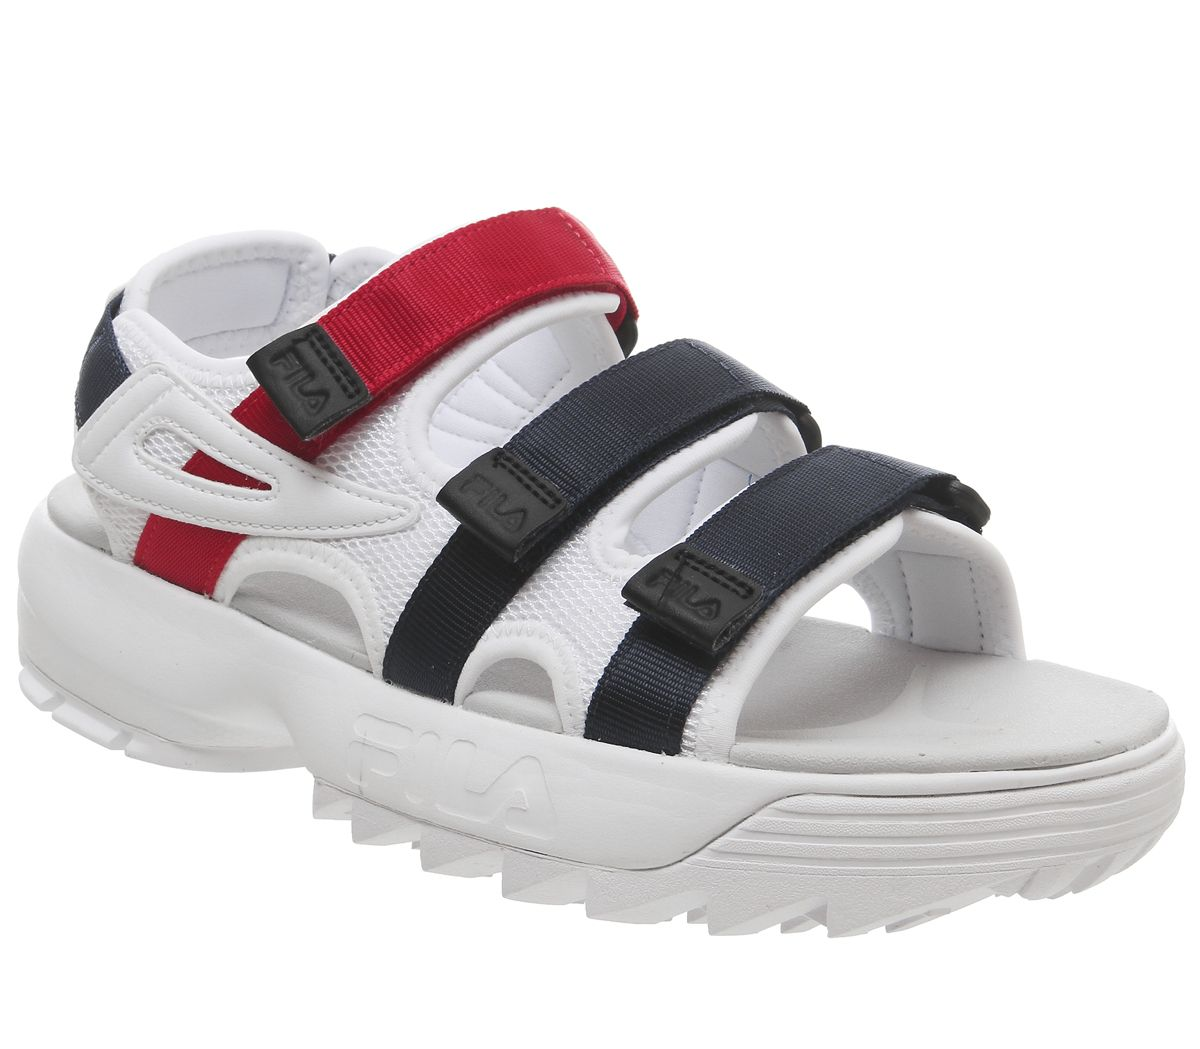 d7d44d8bb715 Fila Disruptor Sandals White Fila Navy Fila Red - Sandals